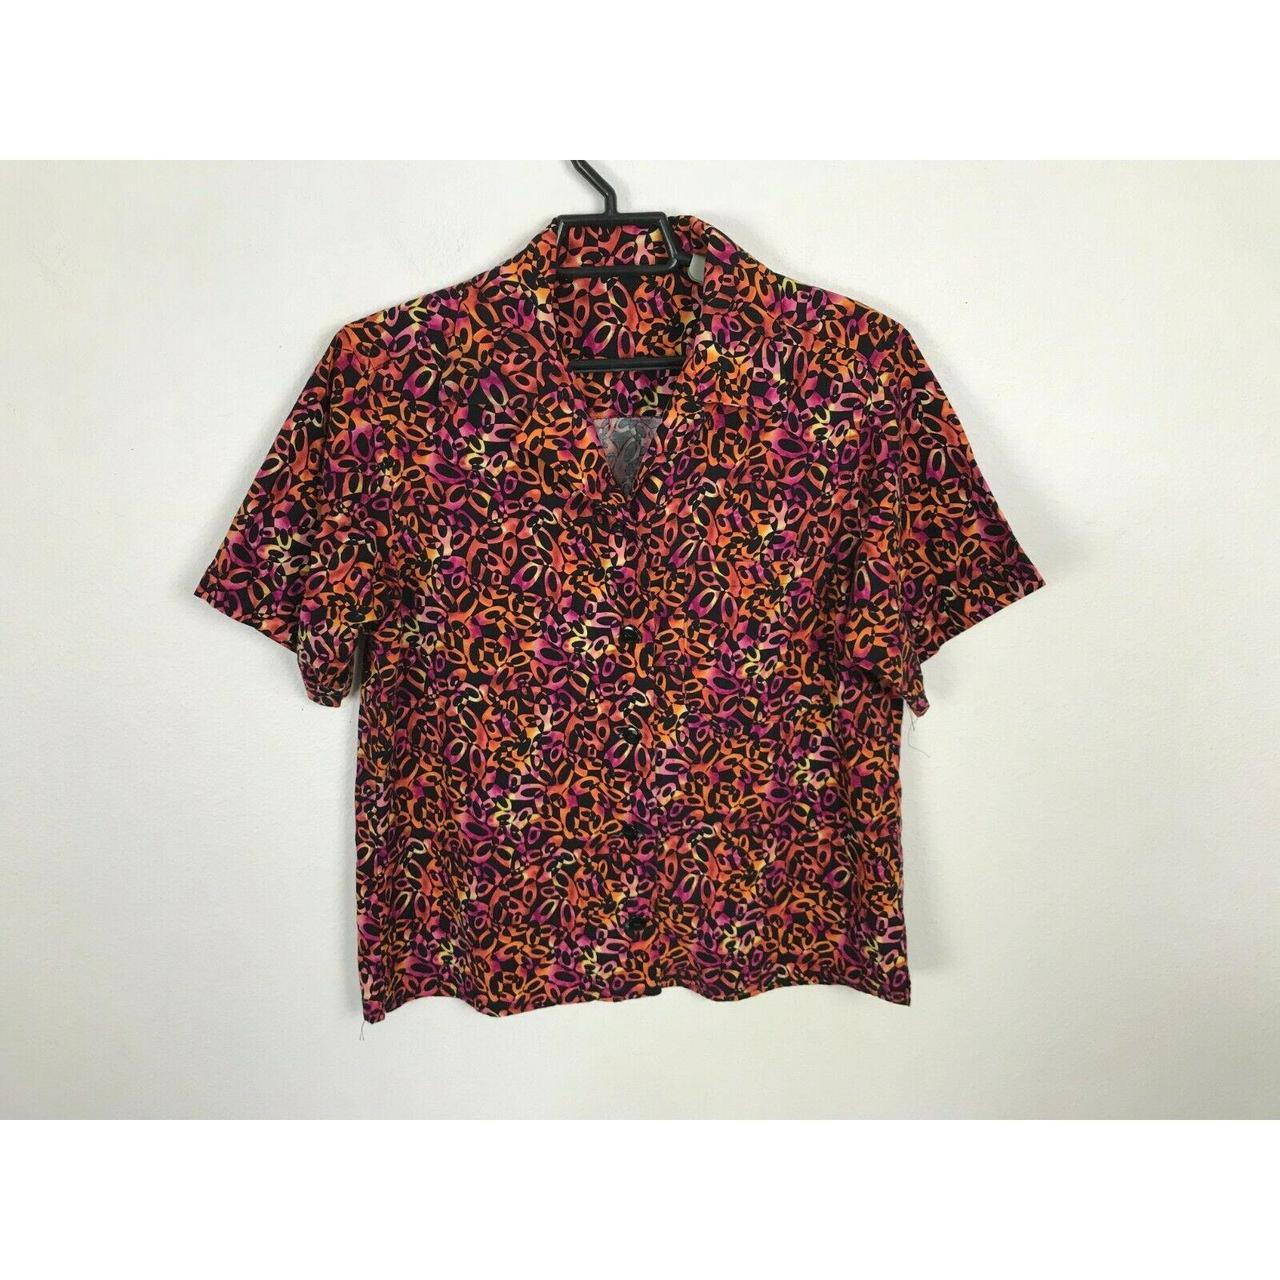 Product Image 1 - Vintage Homemade Hawaiian Shirt Blouse